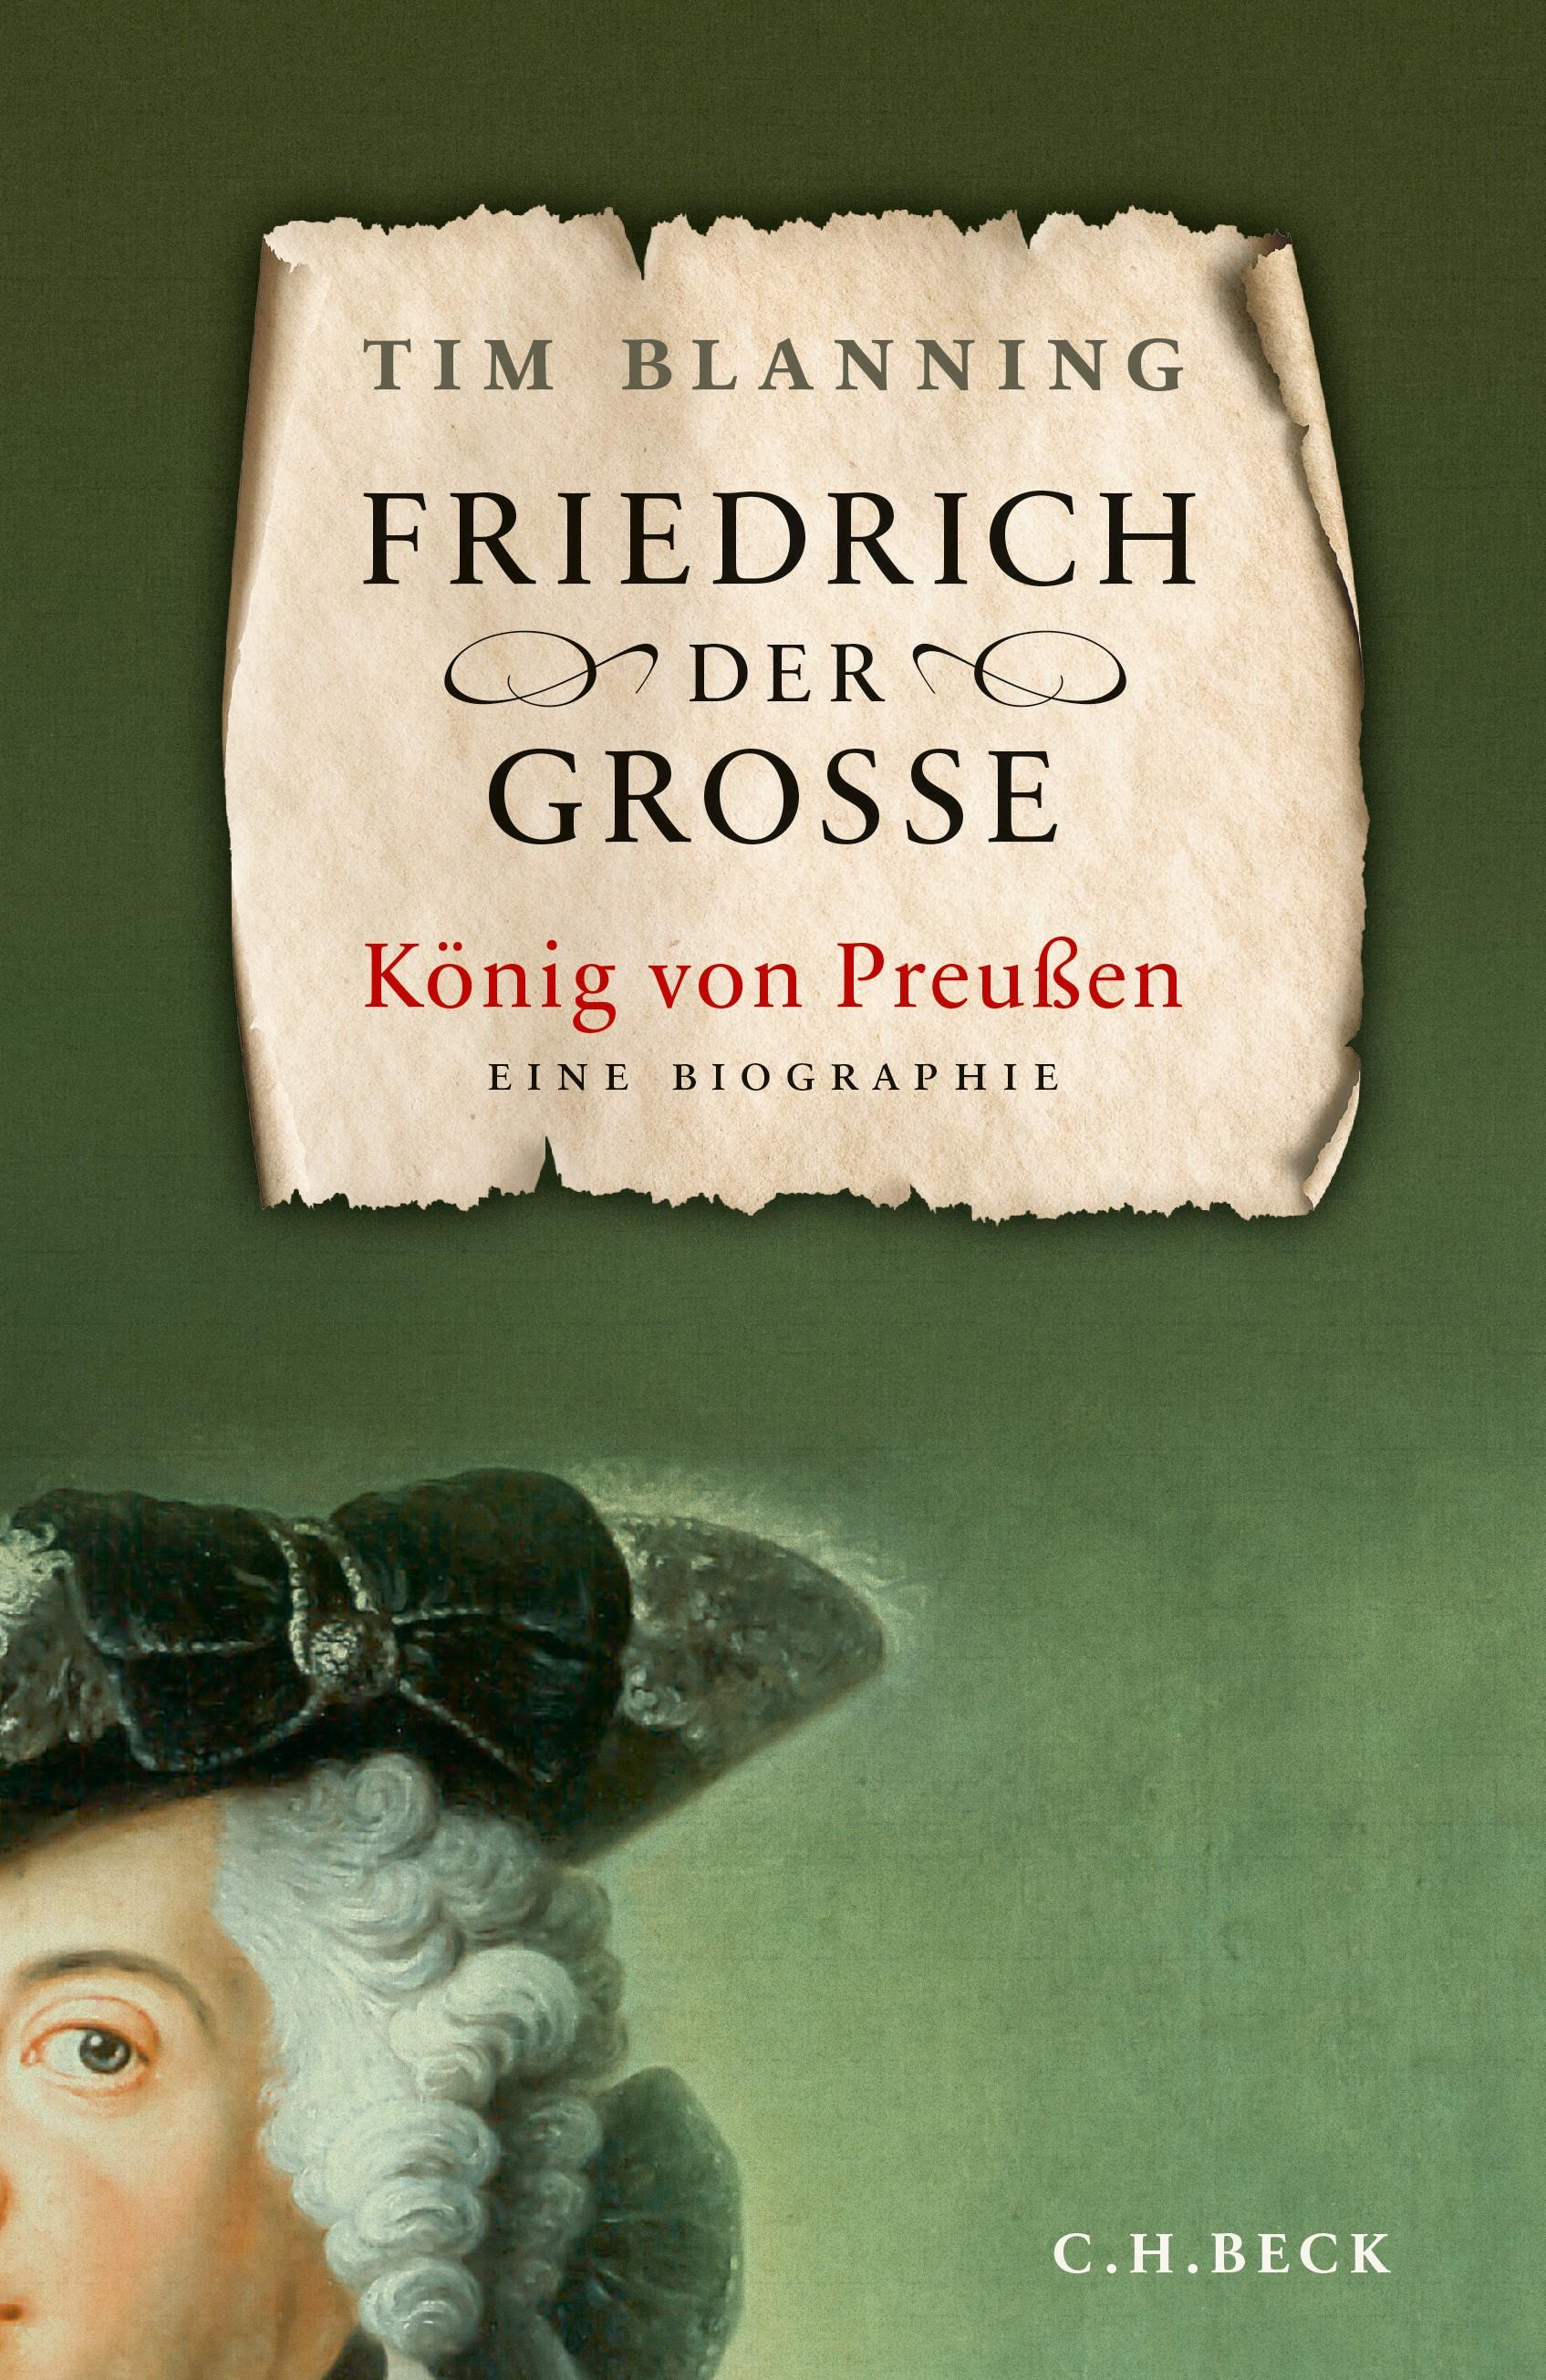 Friedrich der Große | Blanning, Timothy C.W., 2019 | Buch (Cover)